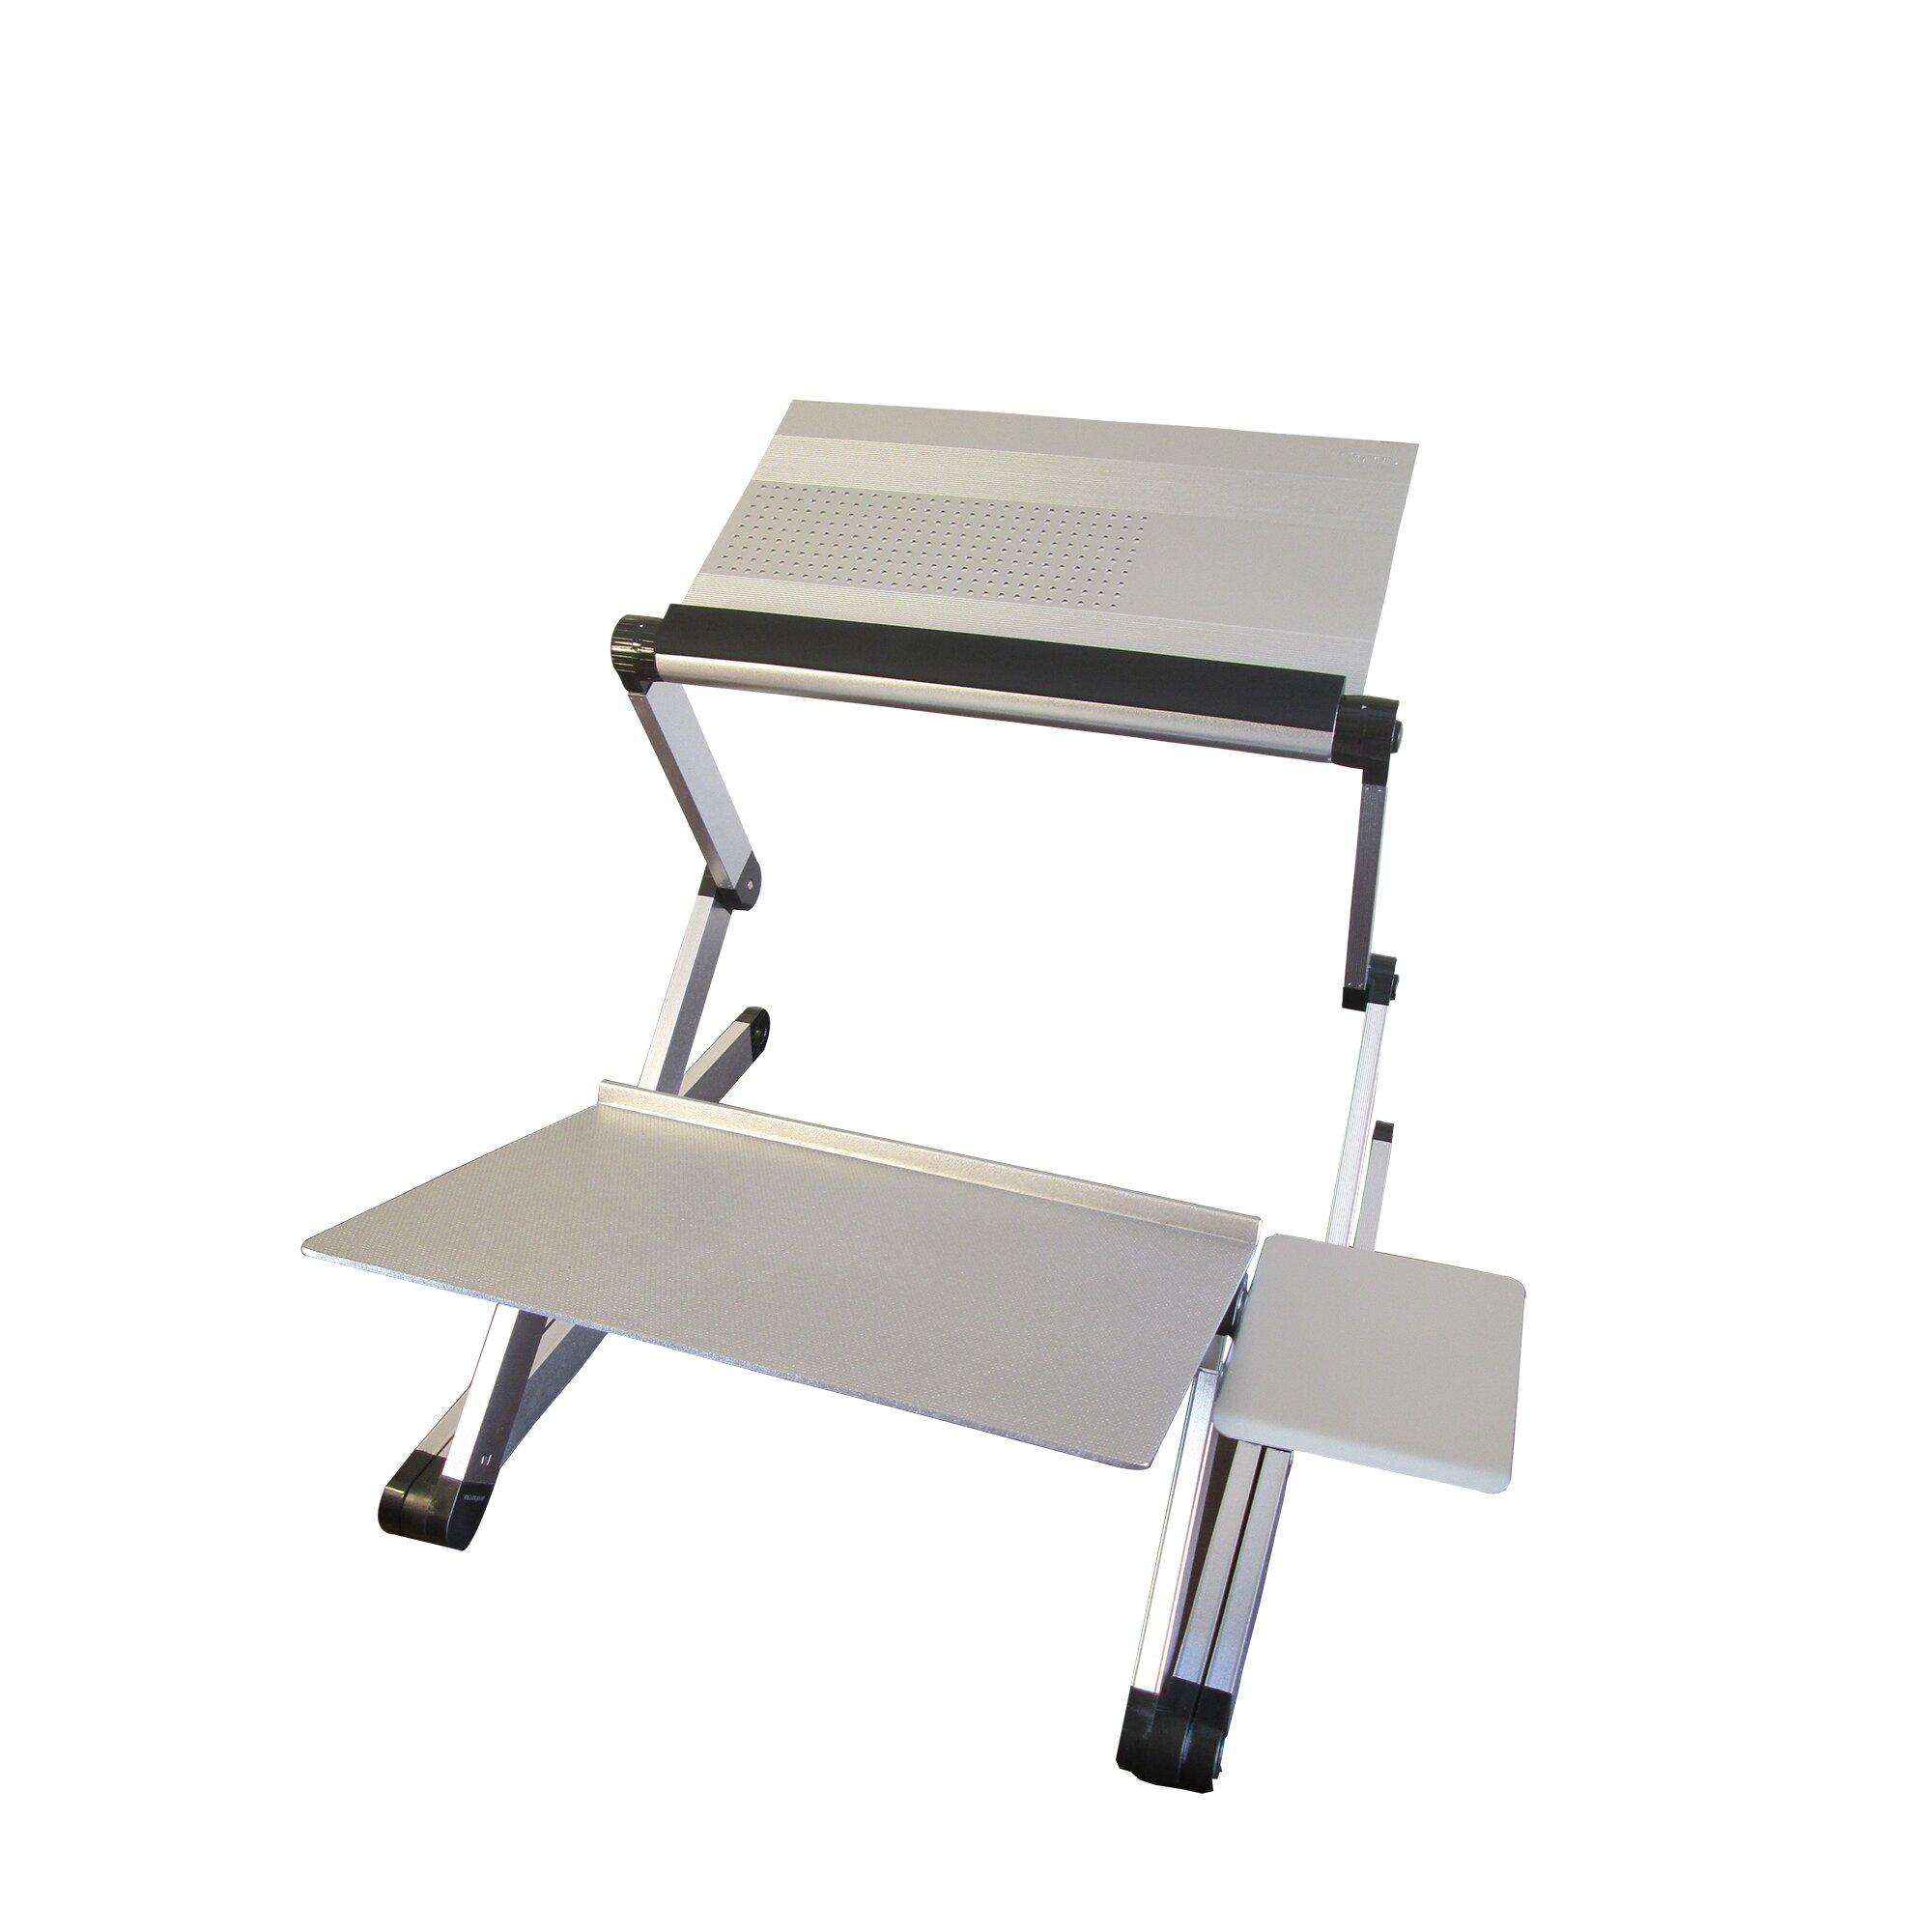 Workez Adjustable Sit Stand Conversion Kit Wayfair